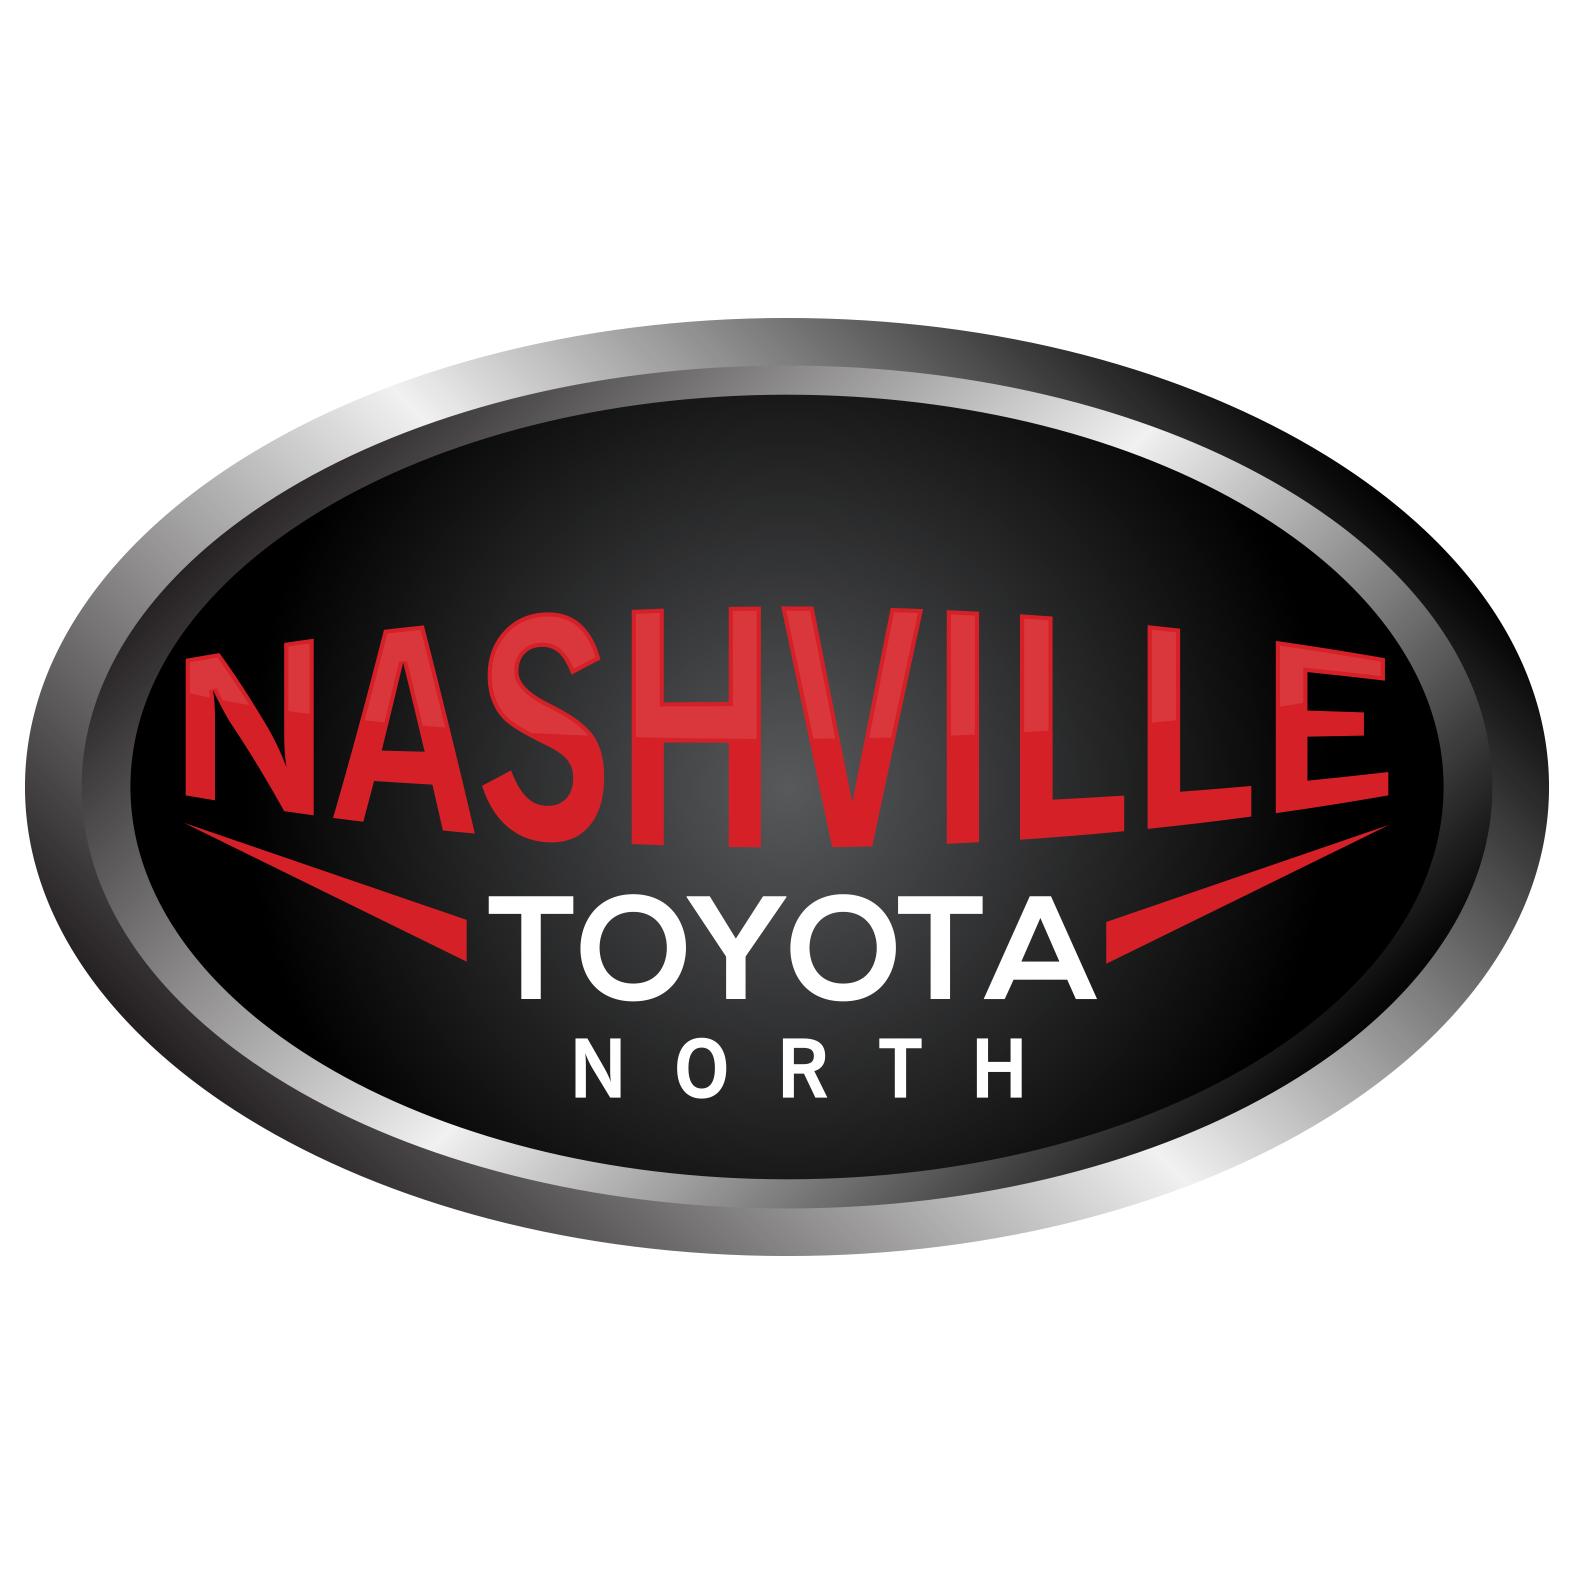 Nashville Toyota North